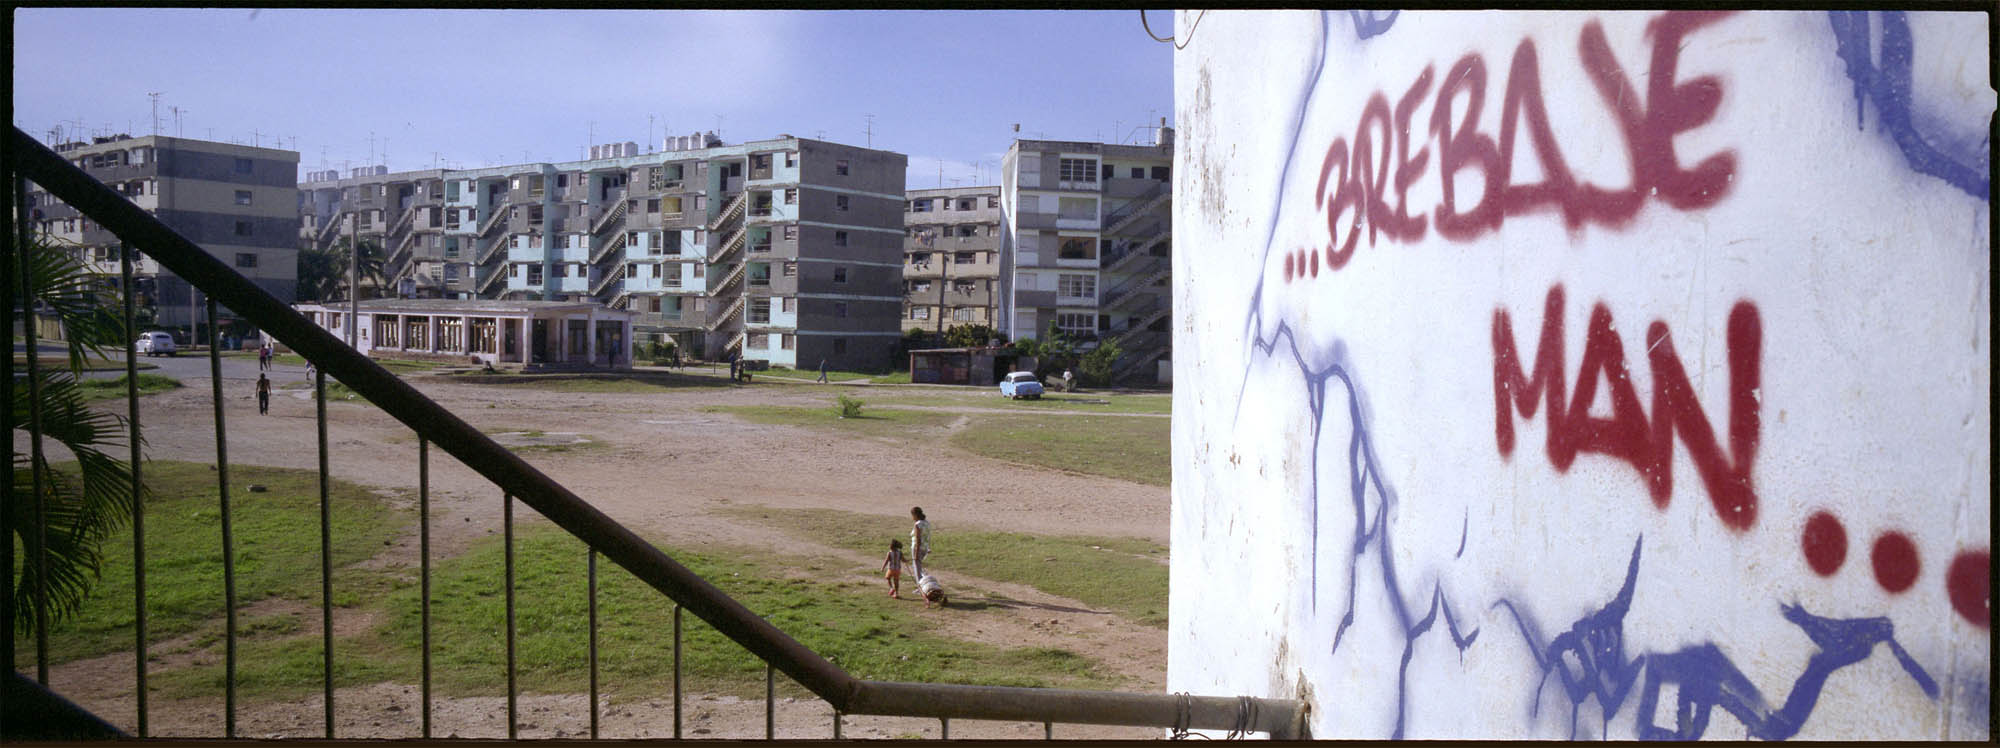 Cuban hip-hop/graffiti series. Source: Oriana Eliçabe.